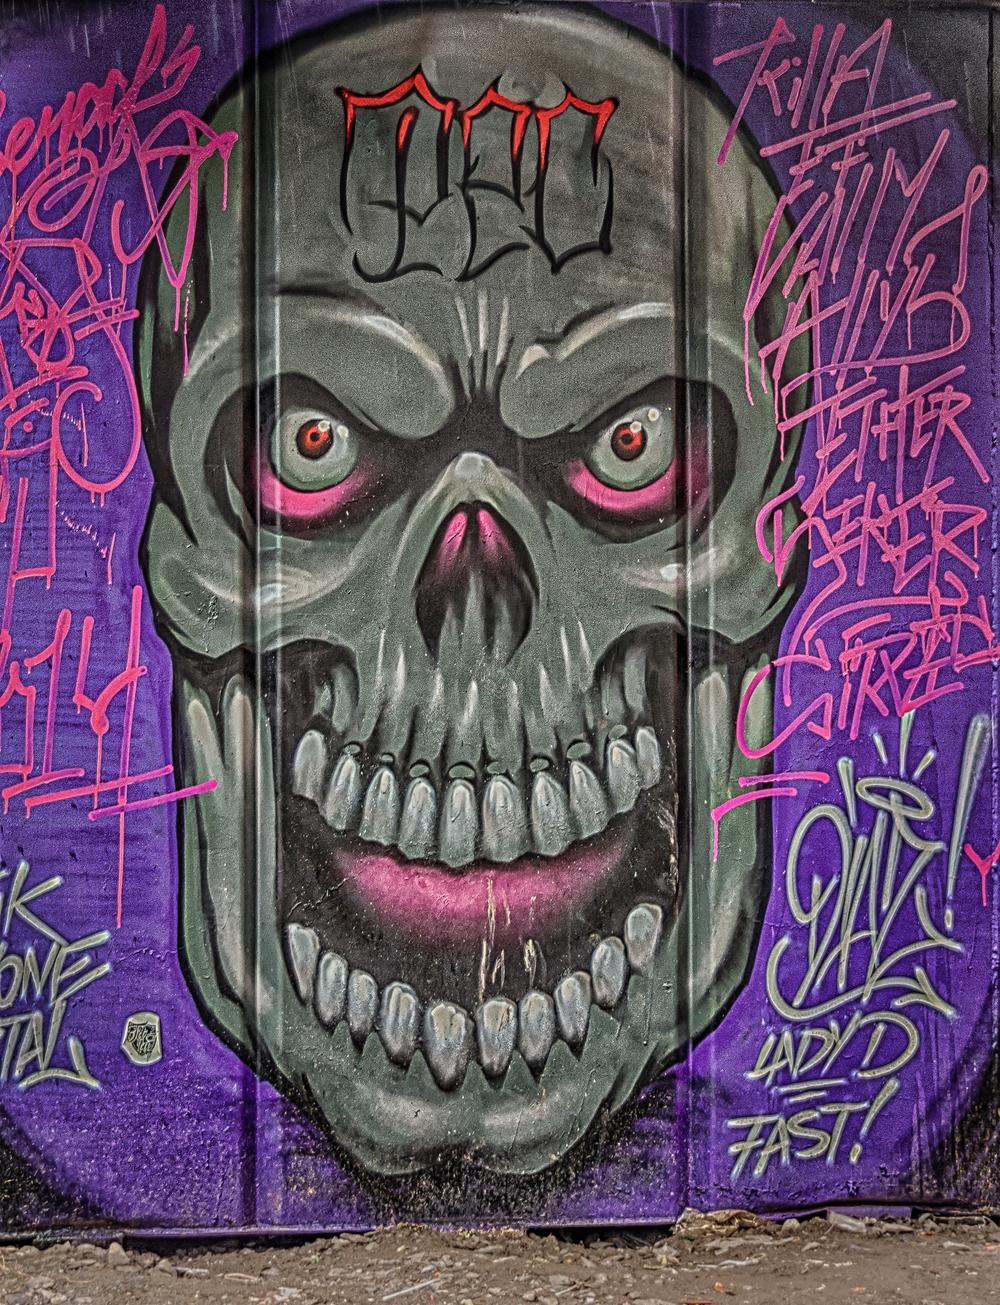 20140816_Grafitti and Architechture - Latin Quarter_IMG_5711_HDR-M.jpg